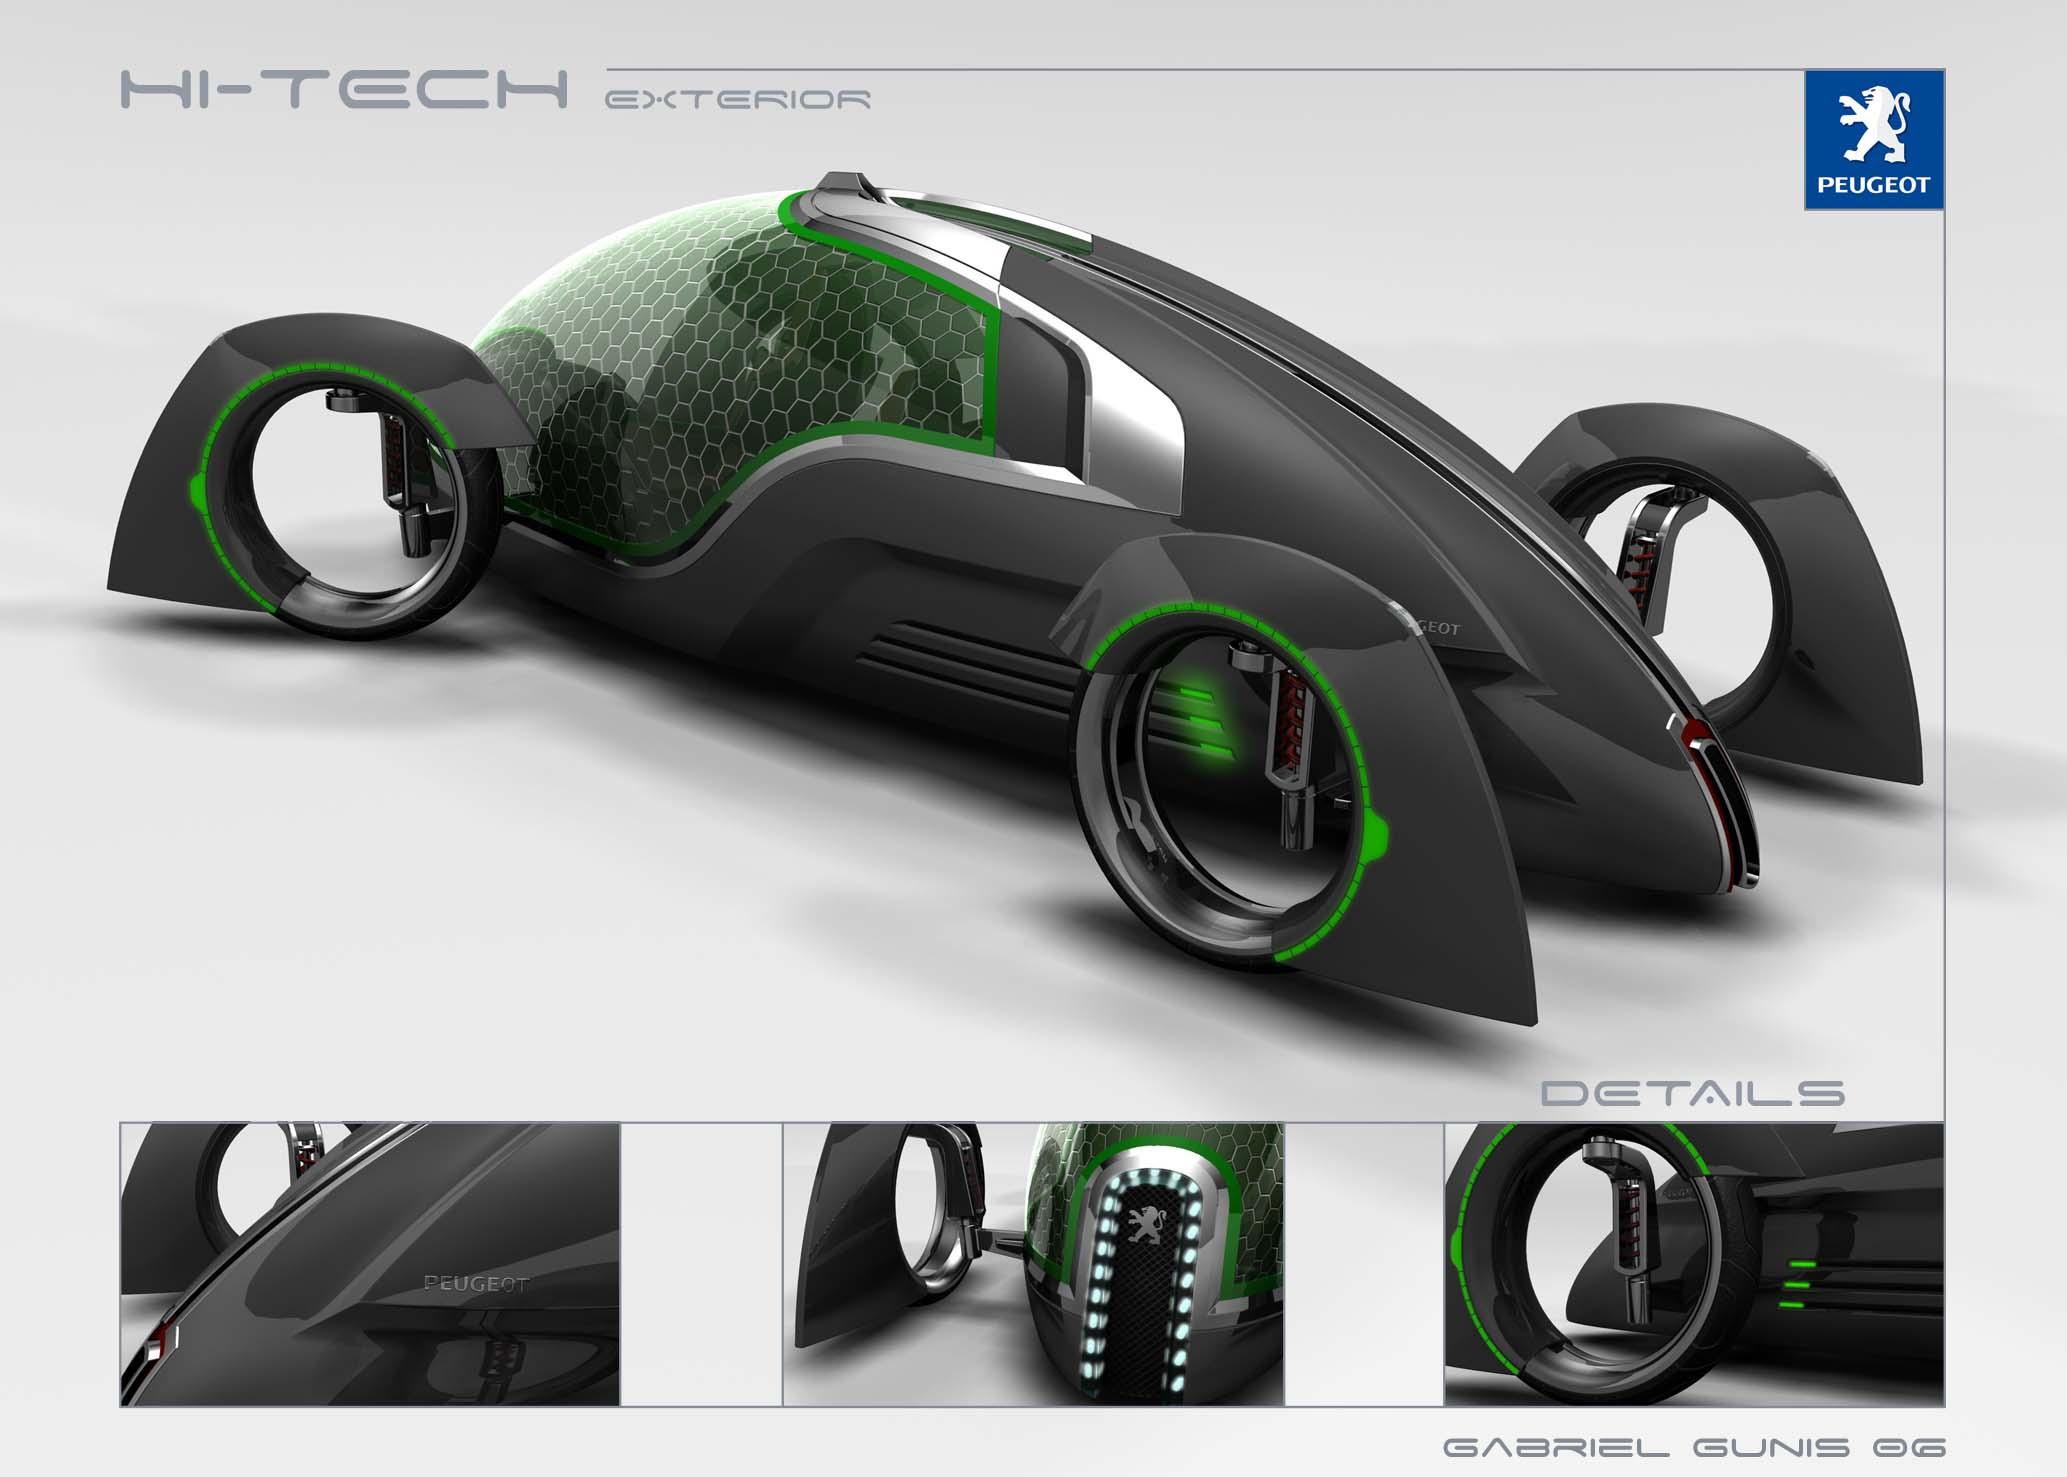 peugeot hi tech photos photogallery with 4 pics. Black Bedroom Furniture Sets. Home Design Ideas